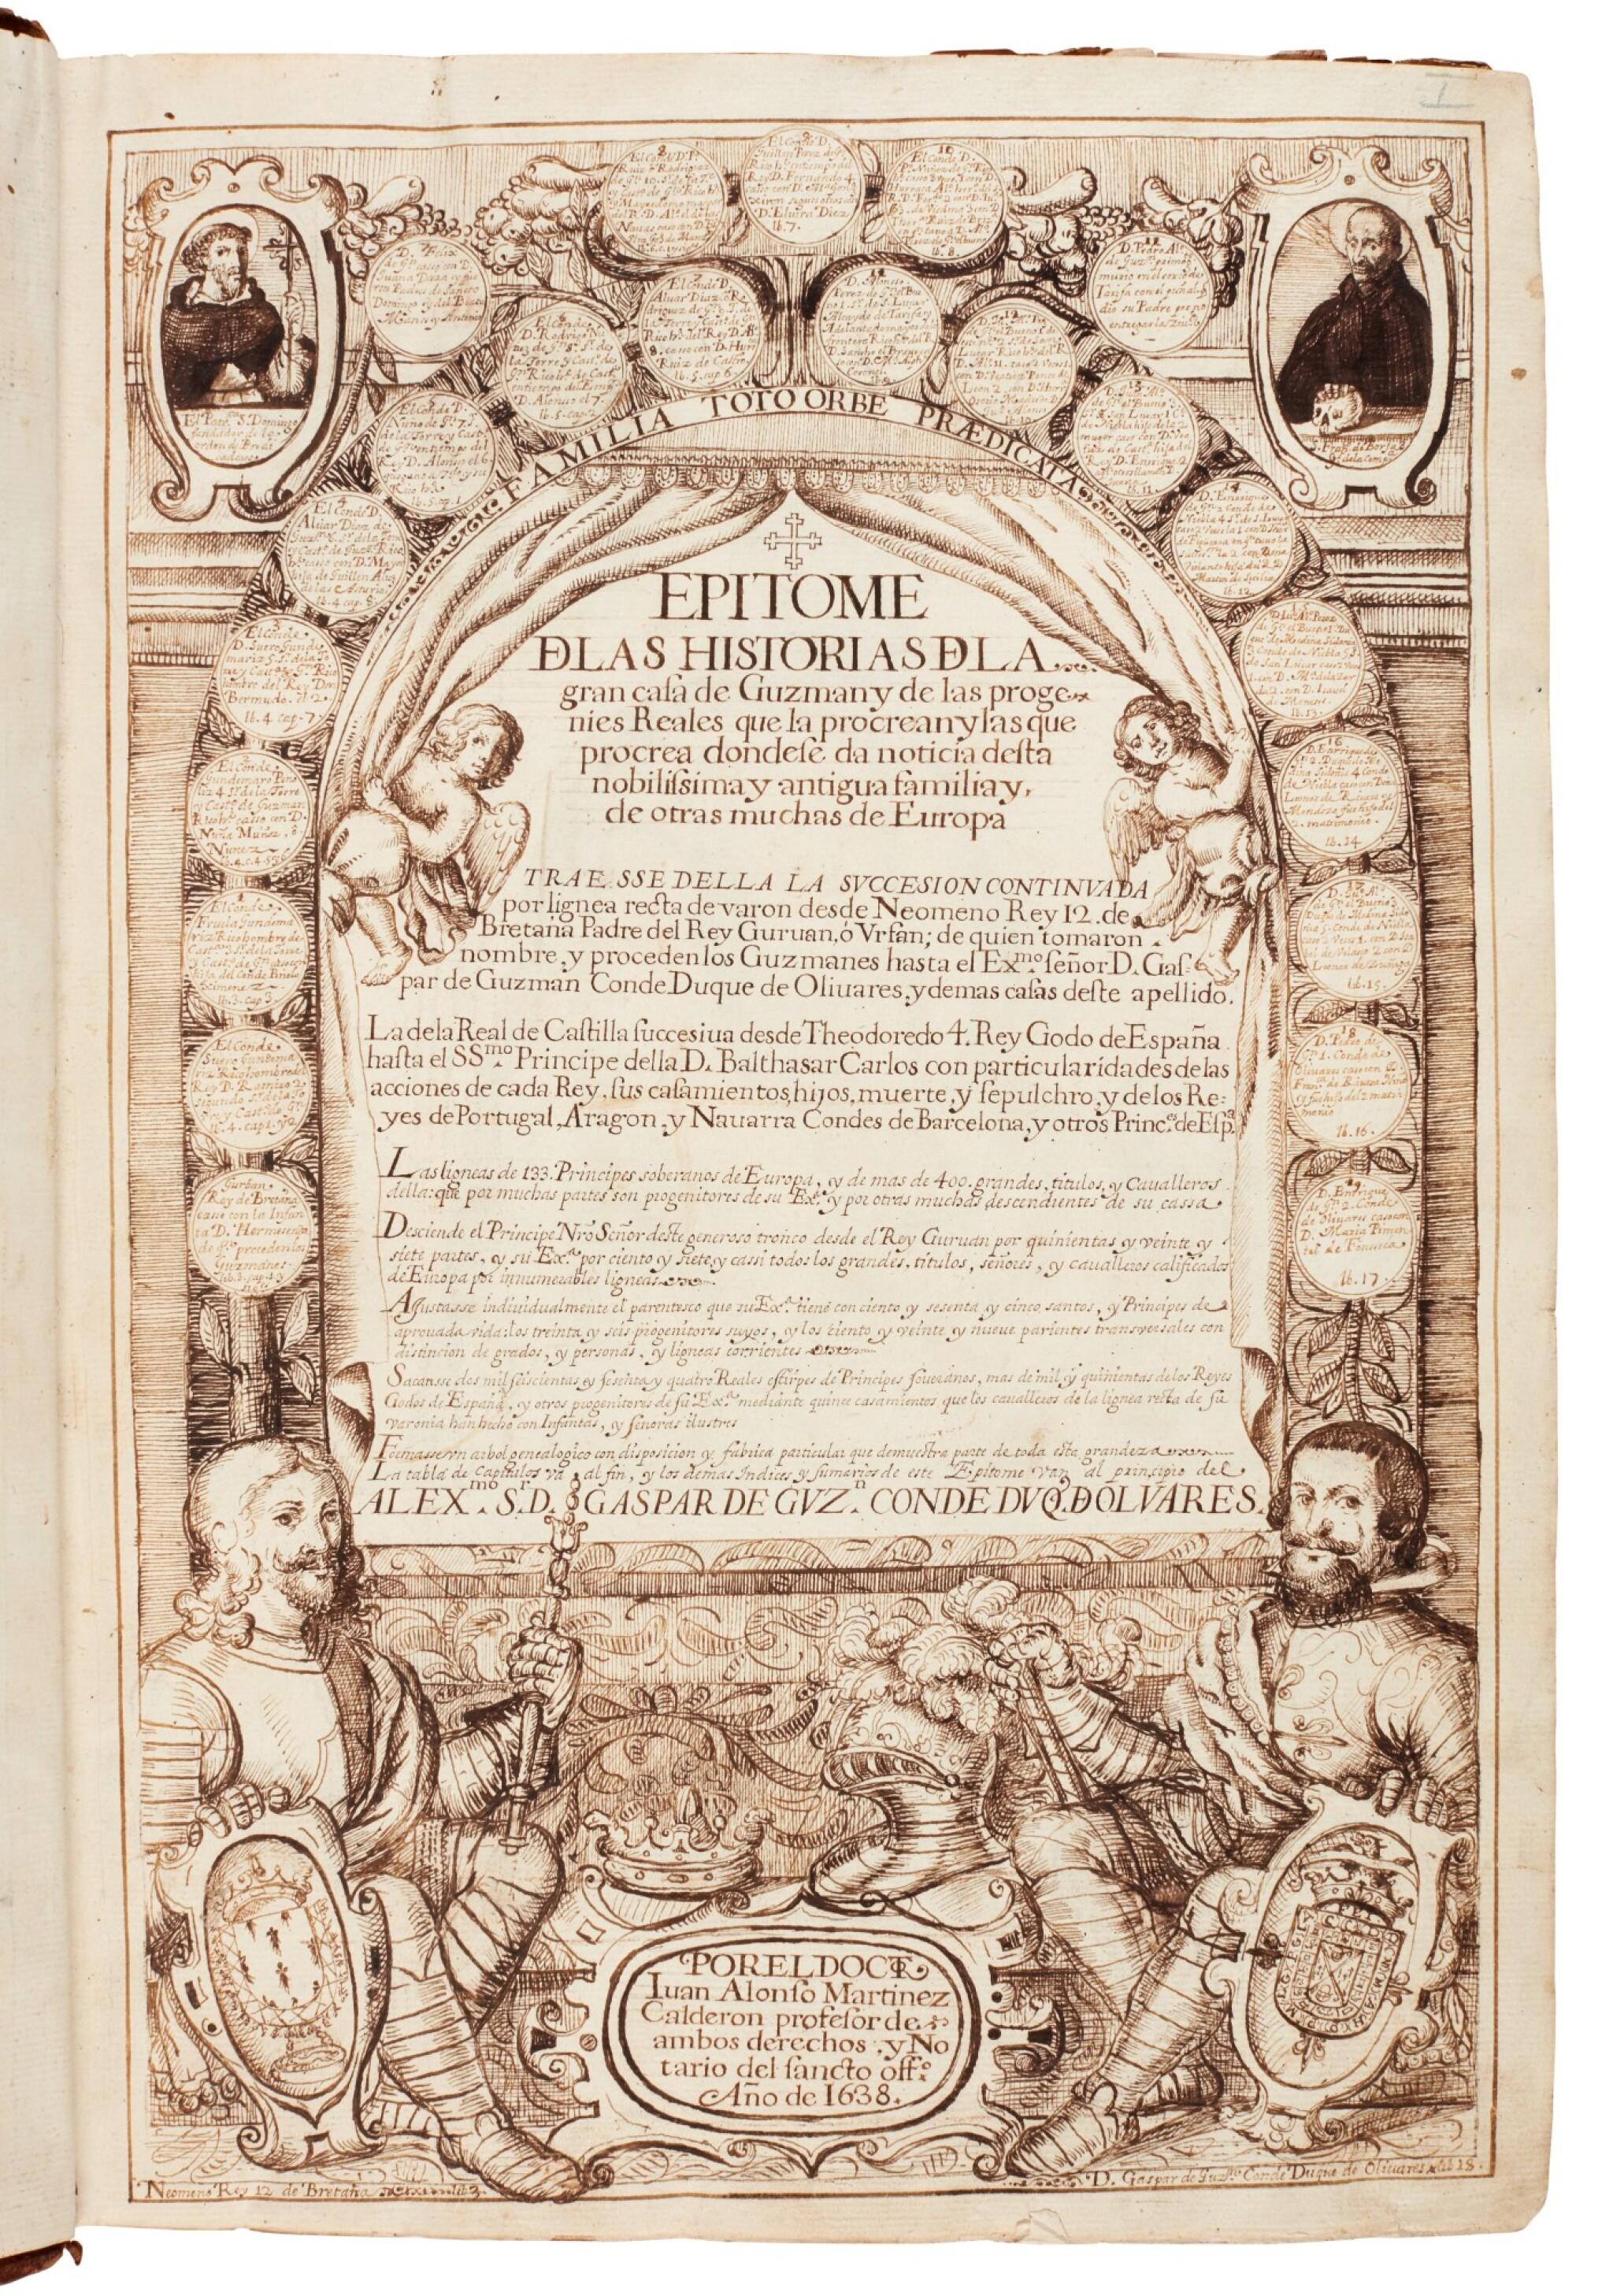 View full screen - View 1 of Lot 179. Martínez Calderón, Epitome de las historias de la gran casa de Guzman, manuscript dated 1638, 2 volumes.